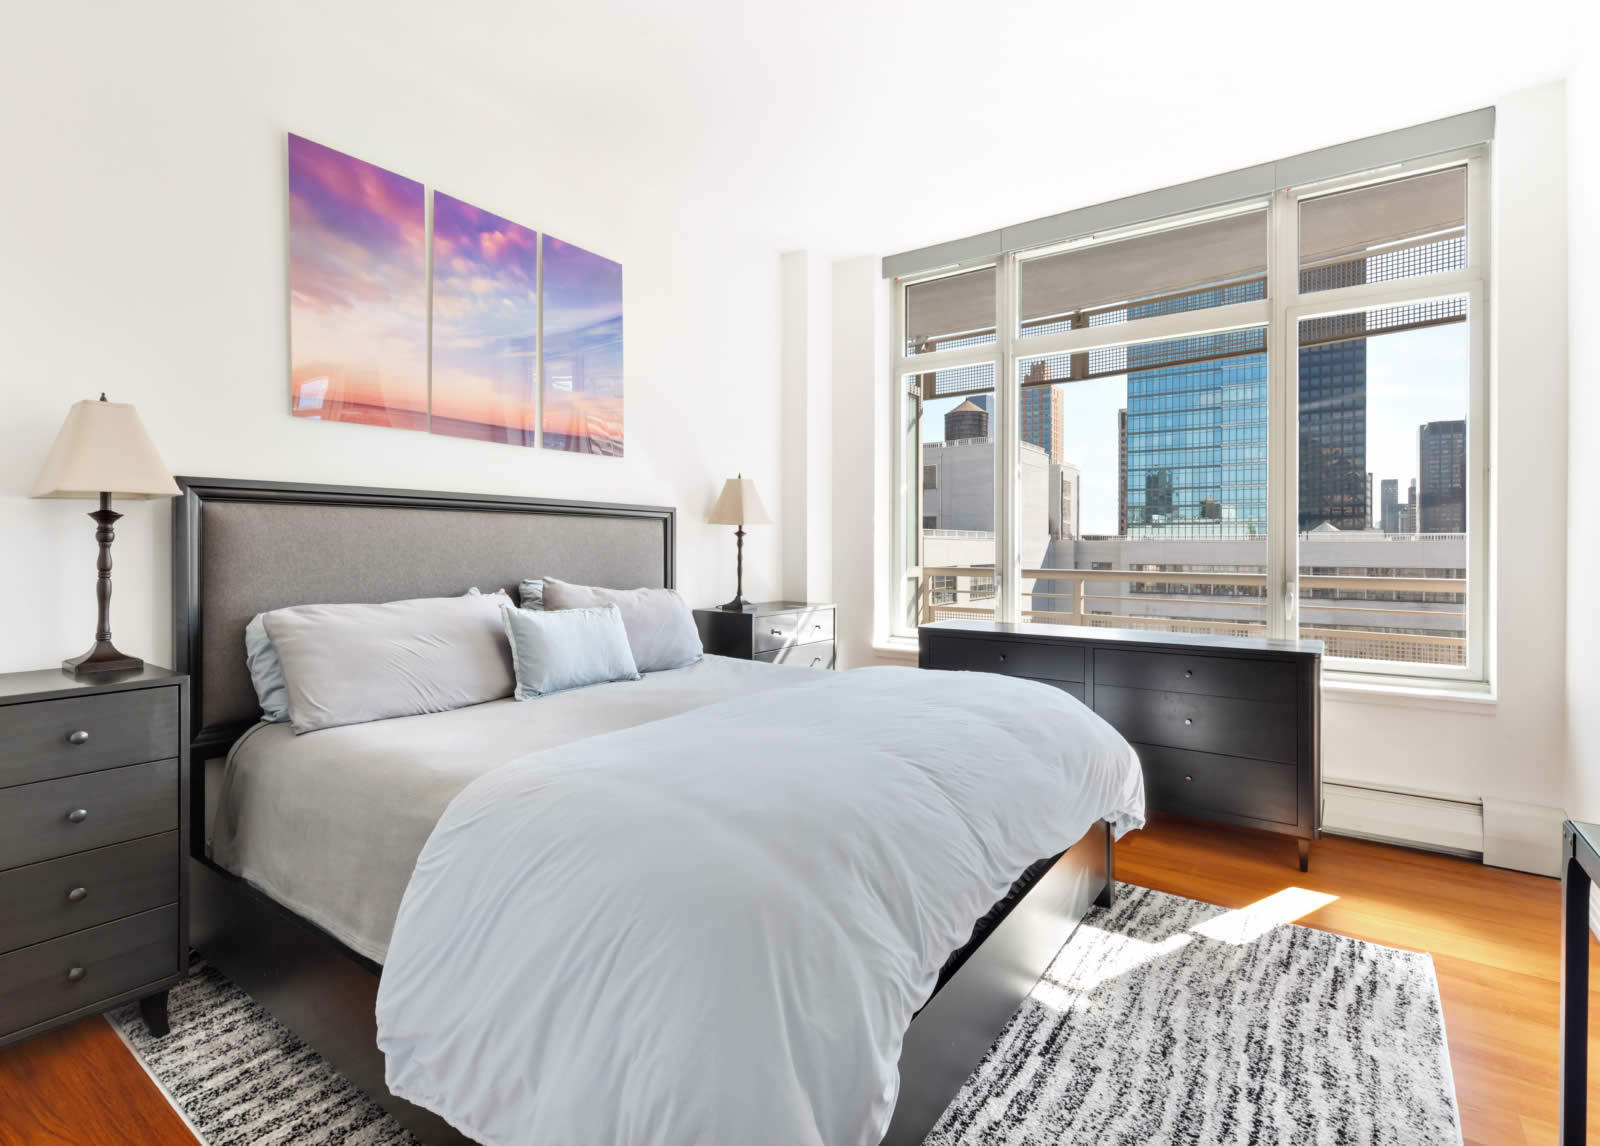 apartment-bay-windows-terrace-upper-east-side-central-park